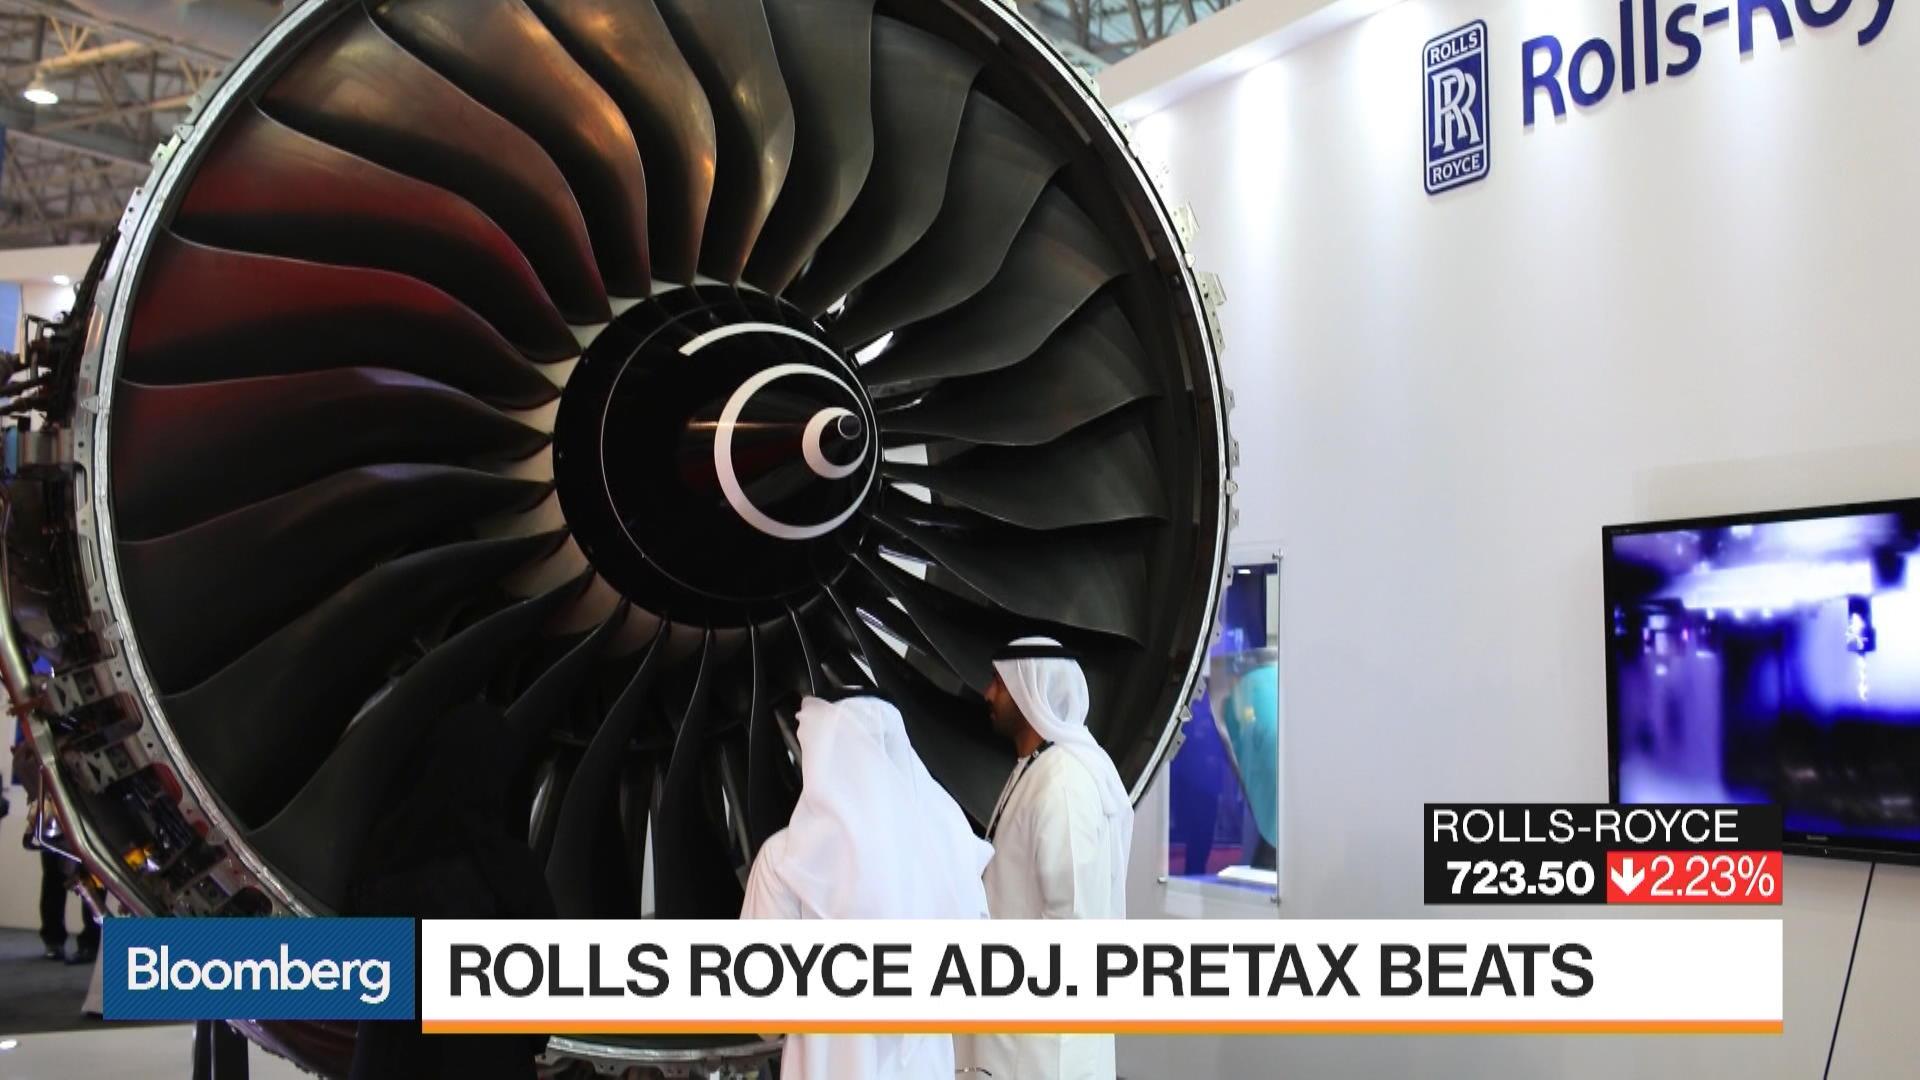 Rolls-Royce Mulls Disposal of Weaker Units as Profit Falls - Bloomberg